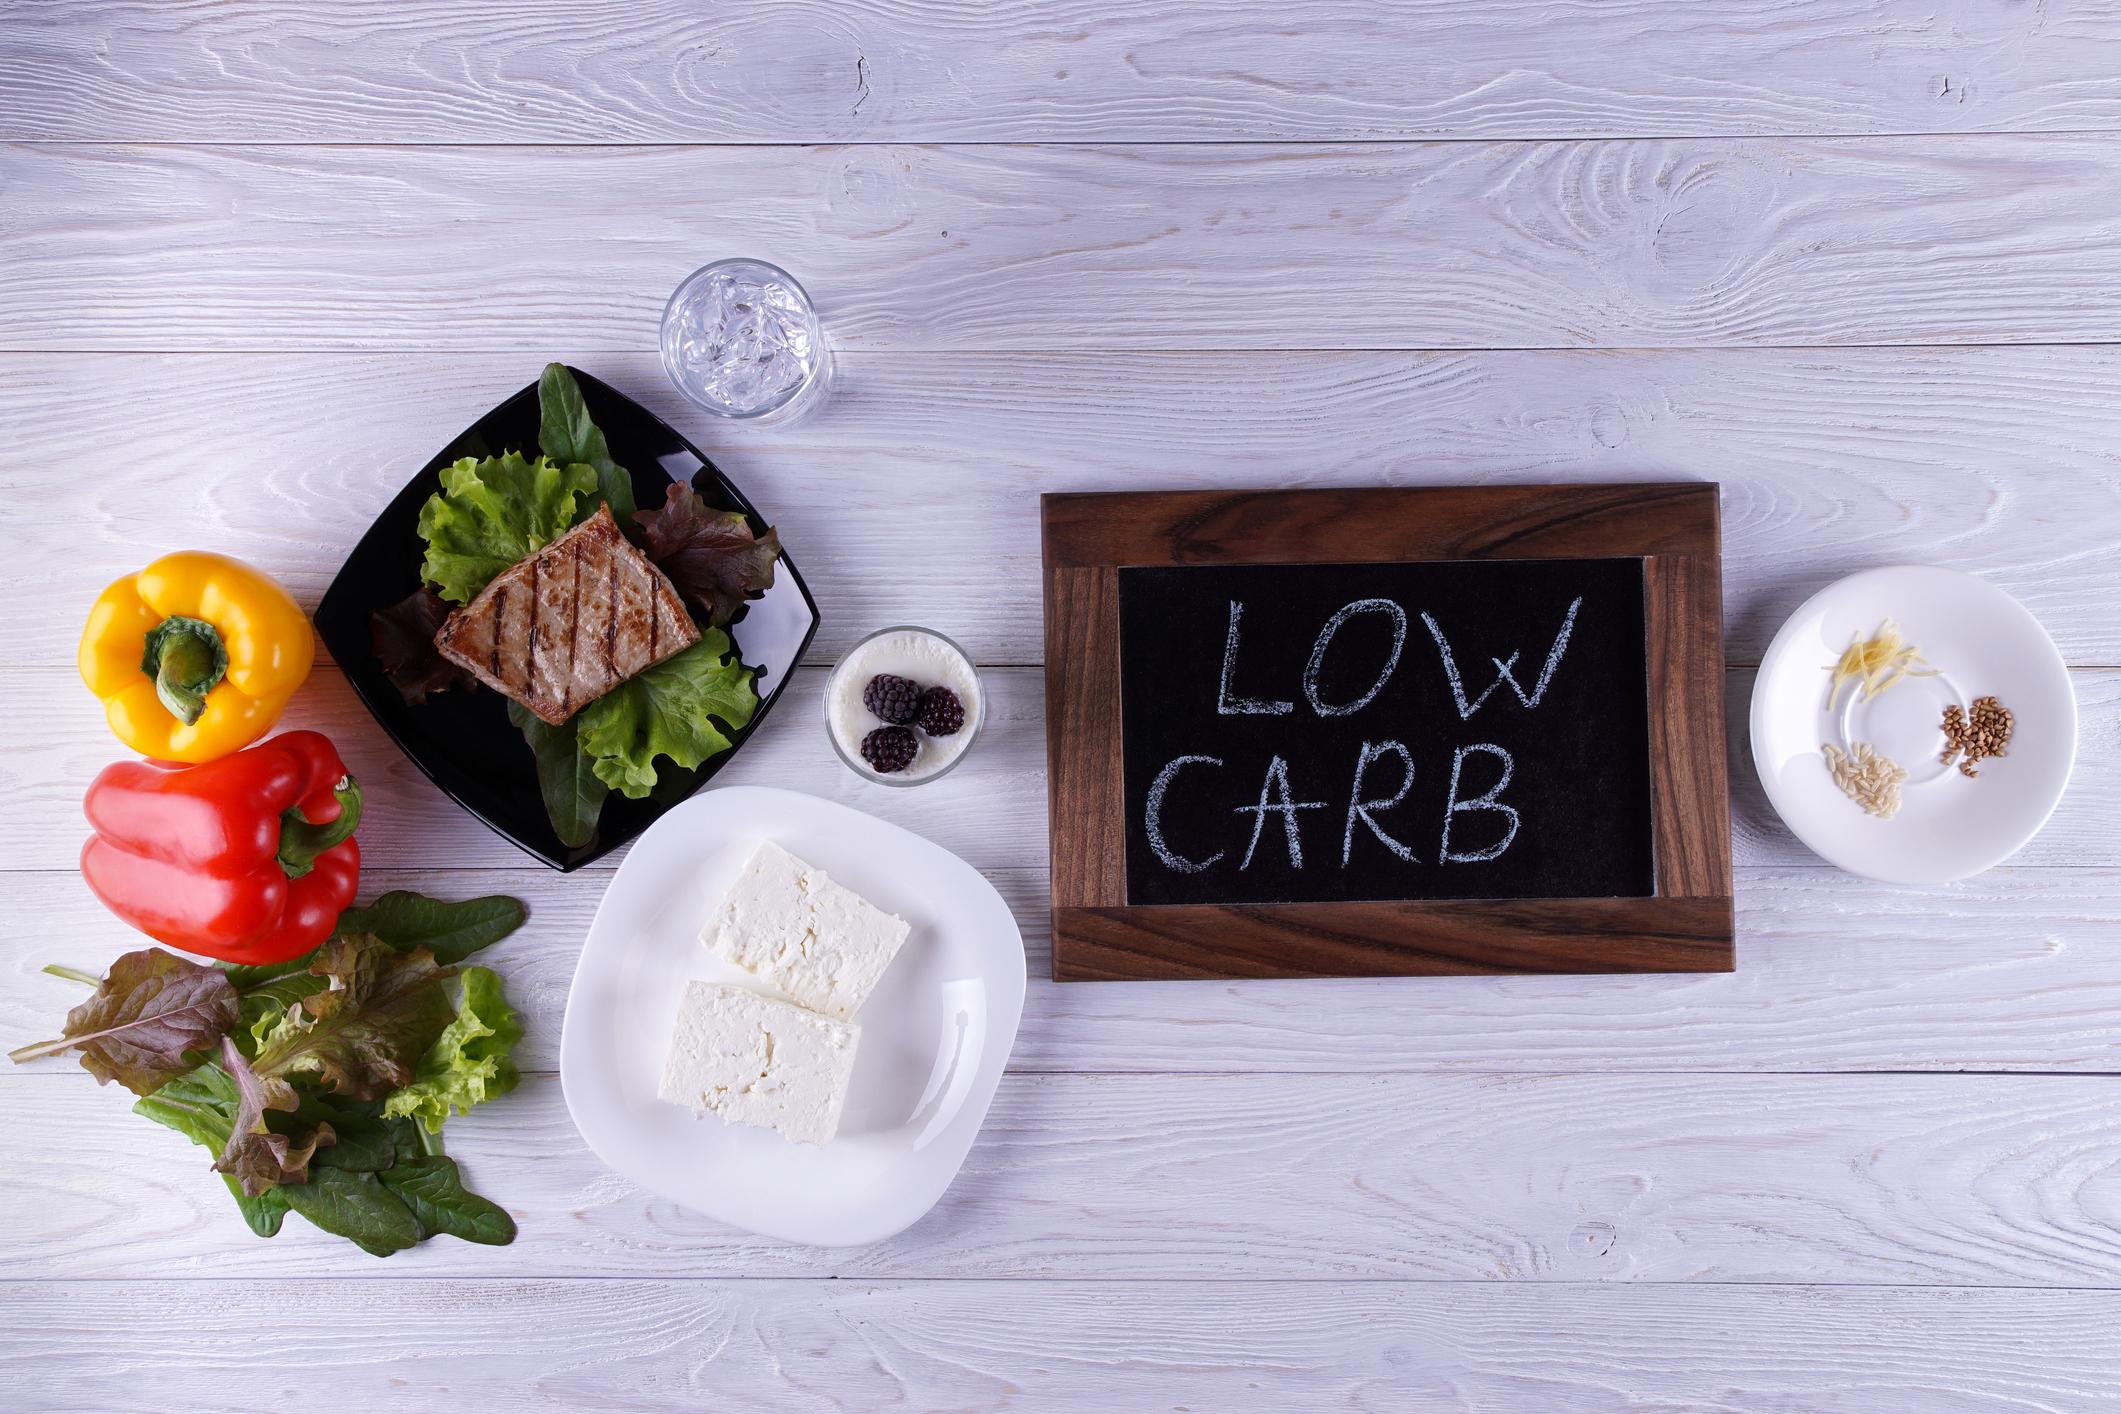 dieta low car e covid